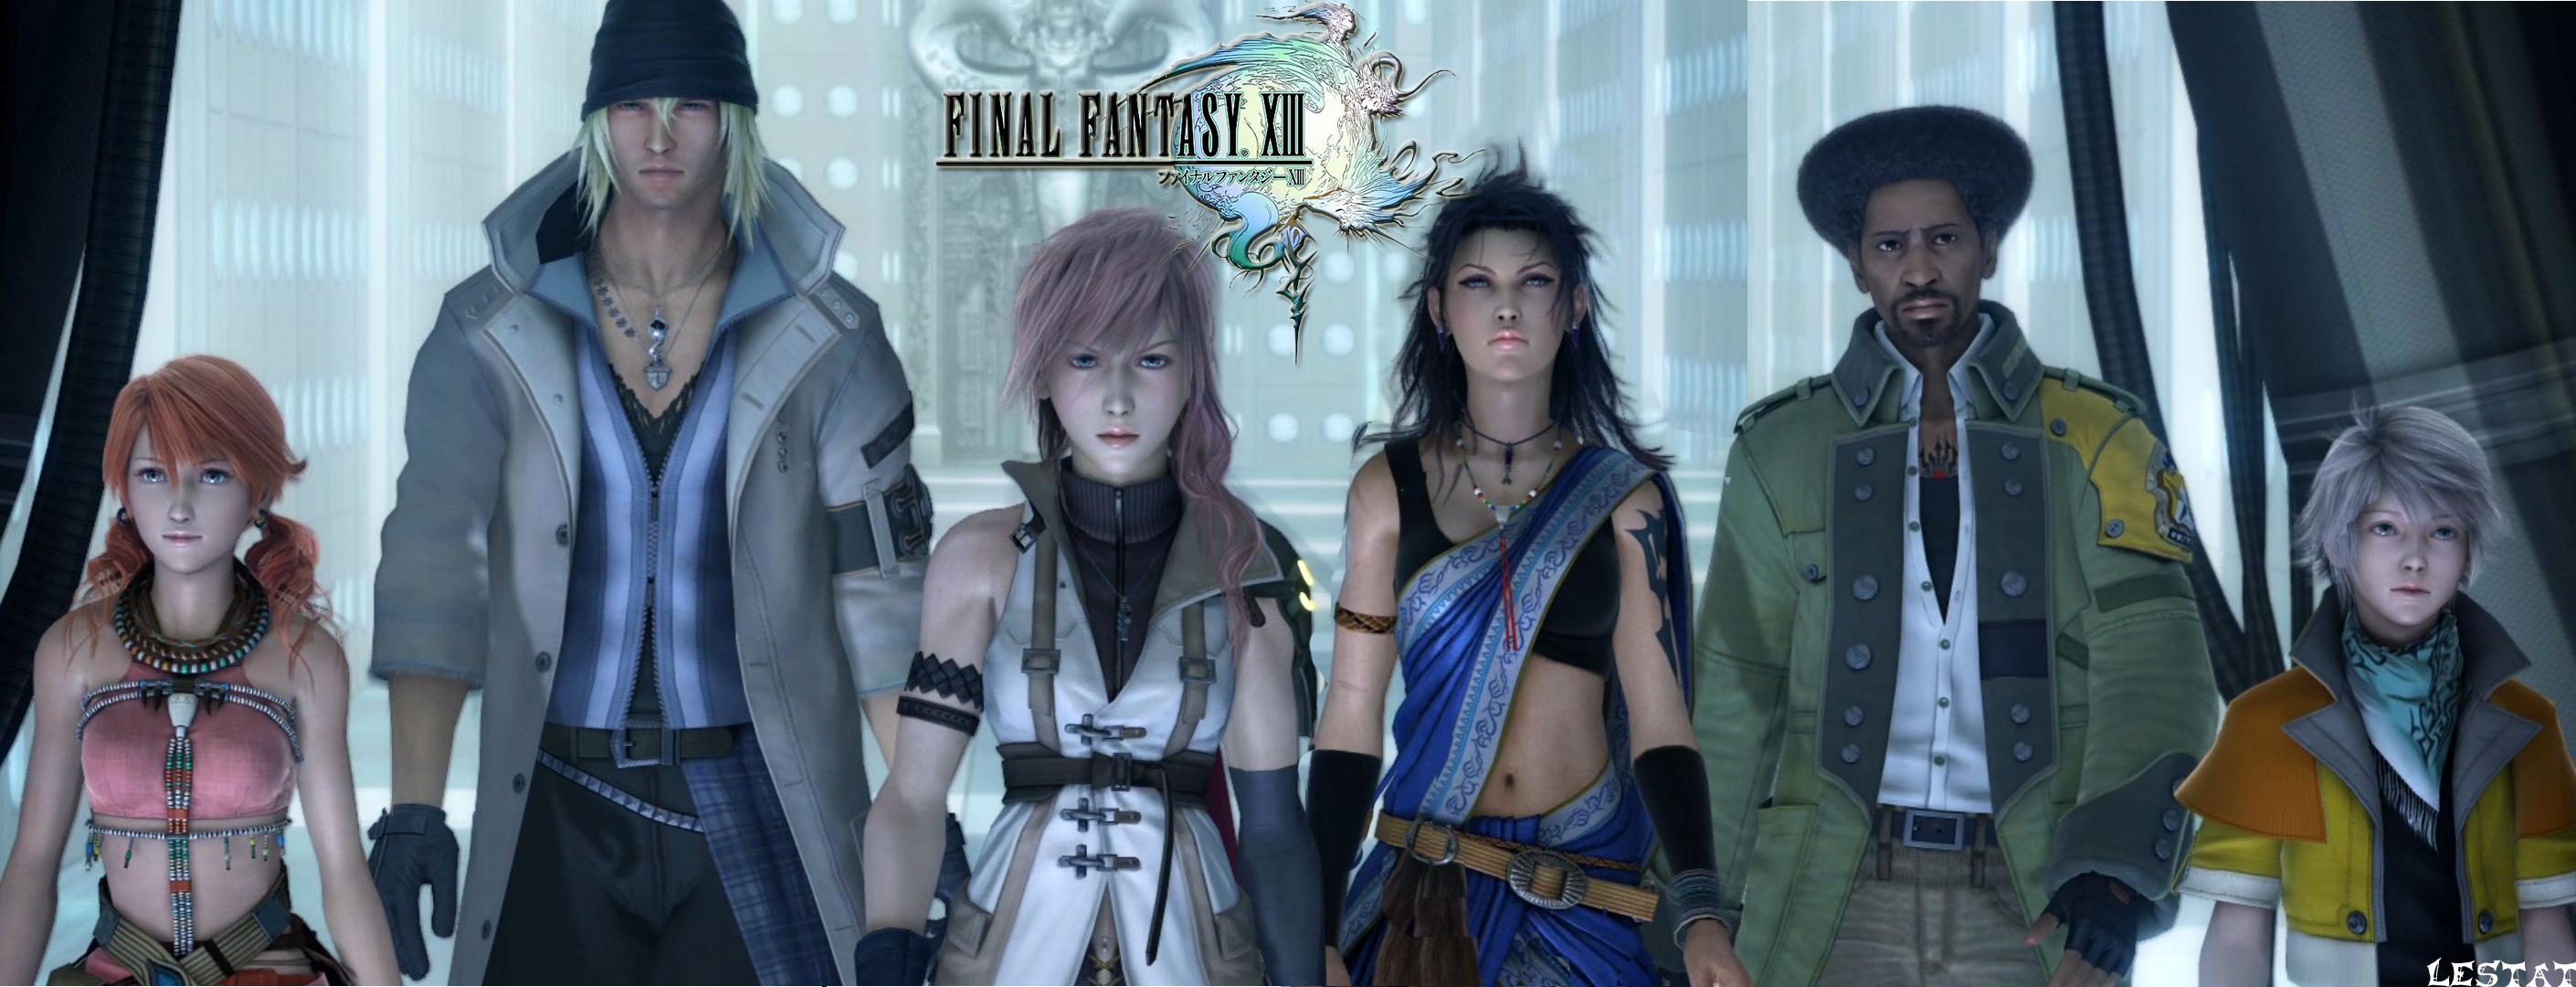 Final Fantasy Xiii Characters Jimquisition: Batman I...